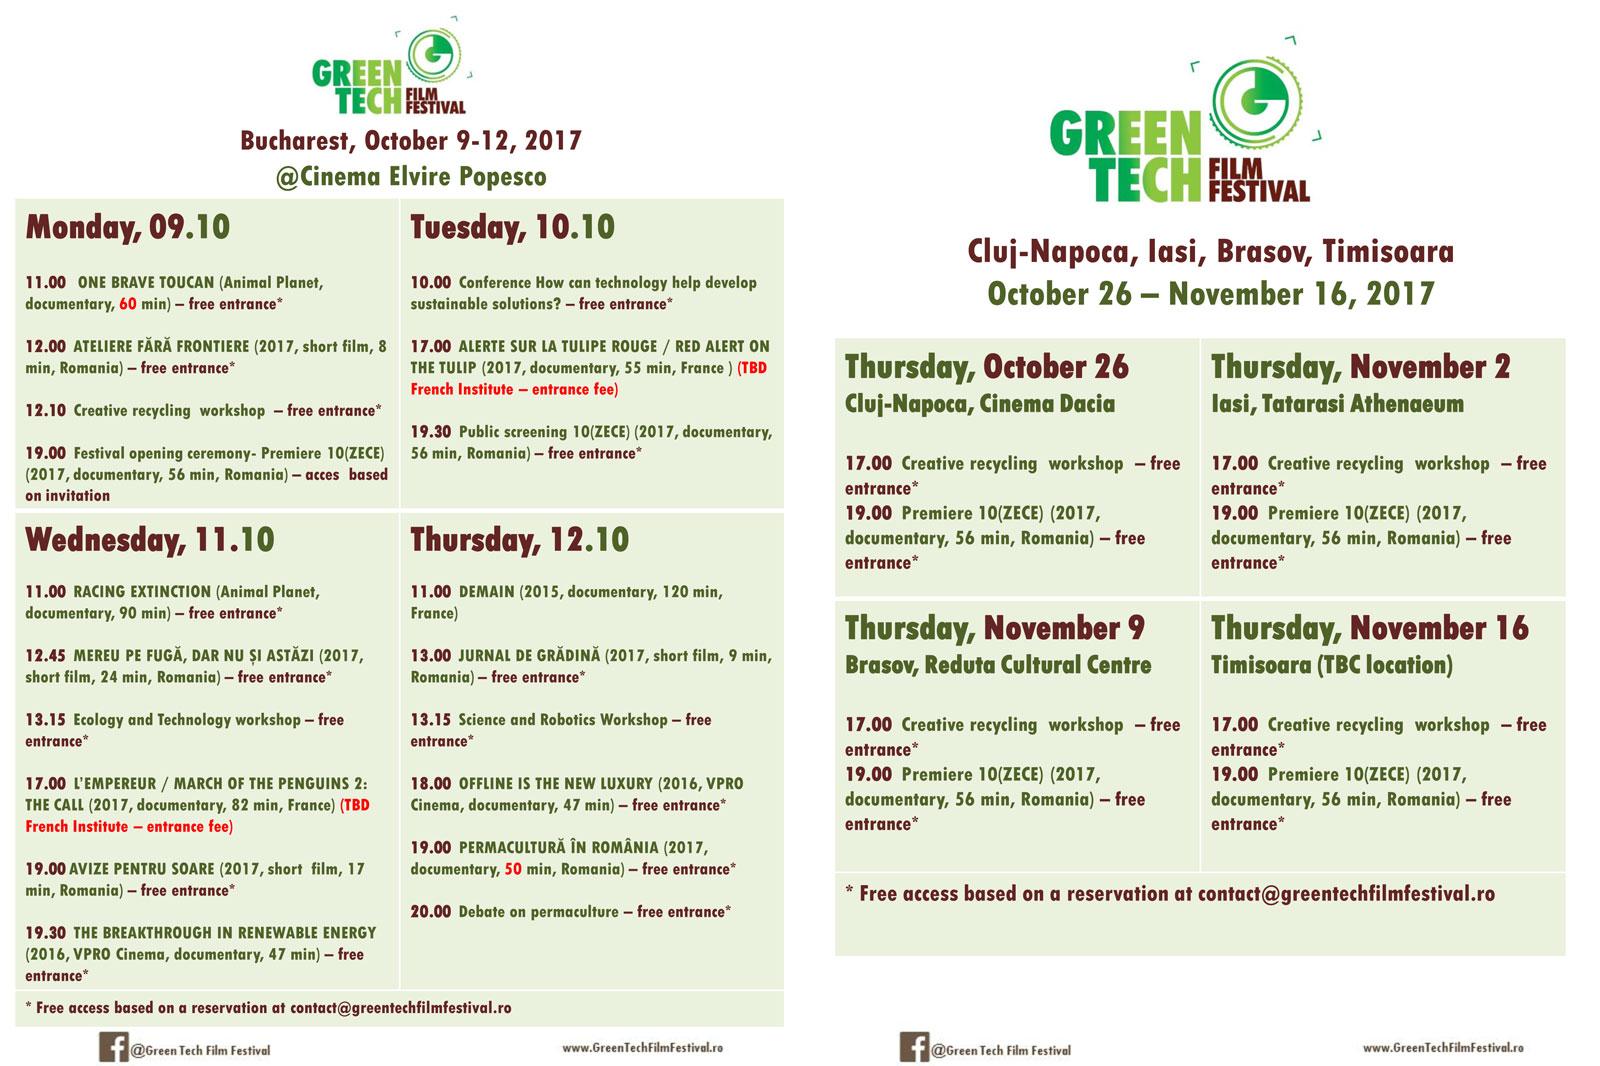 green-tech-film-festival-stiinta-tehnica-3